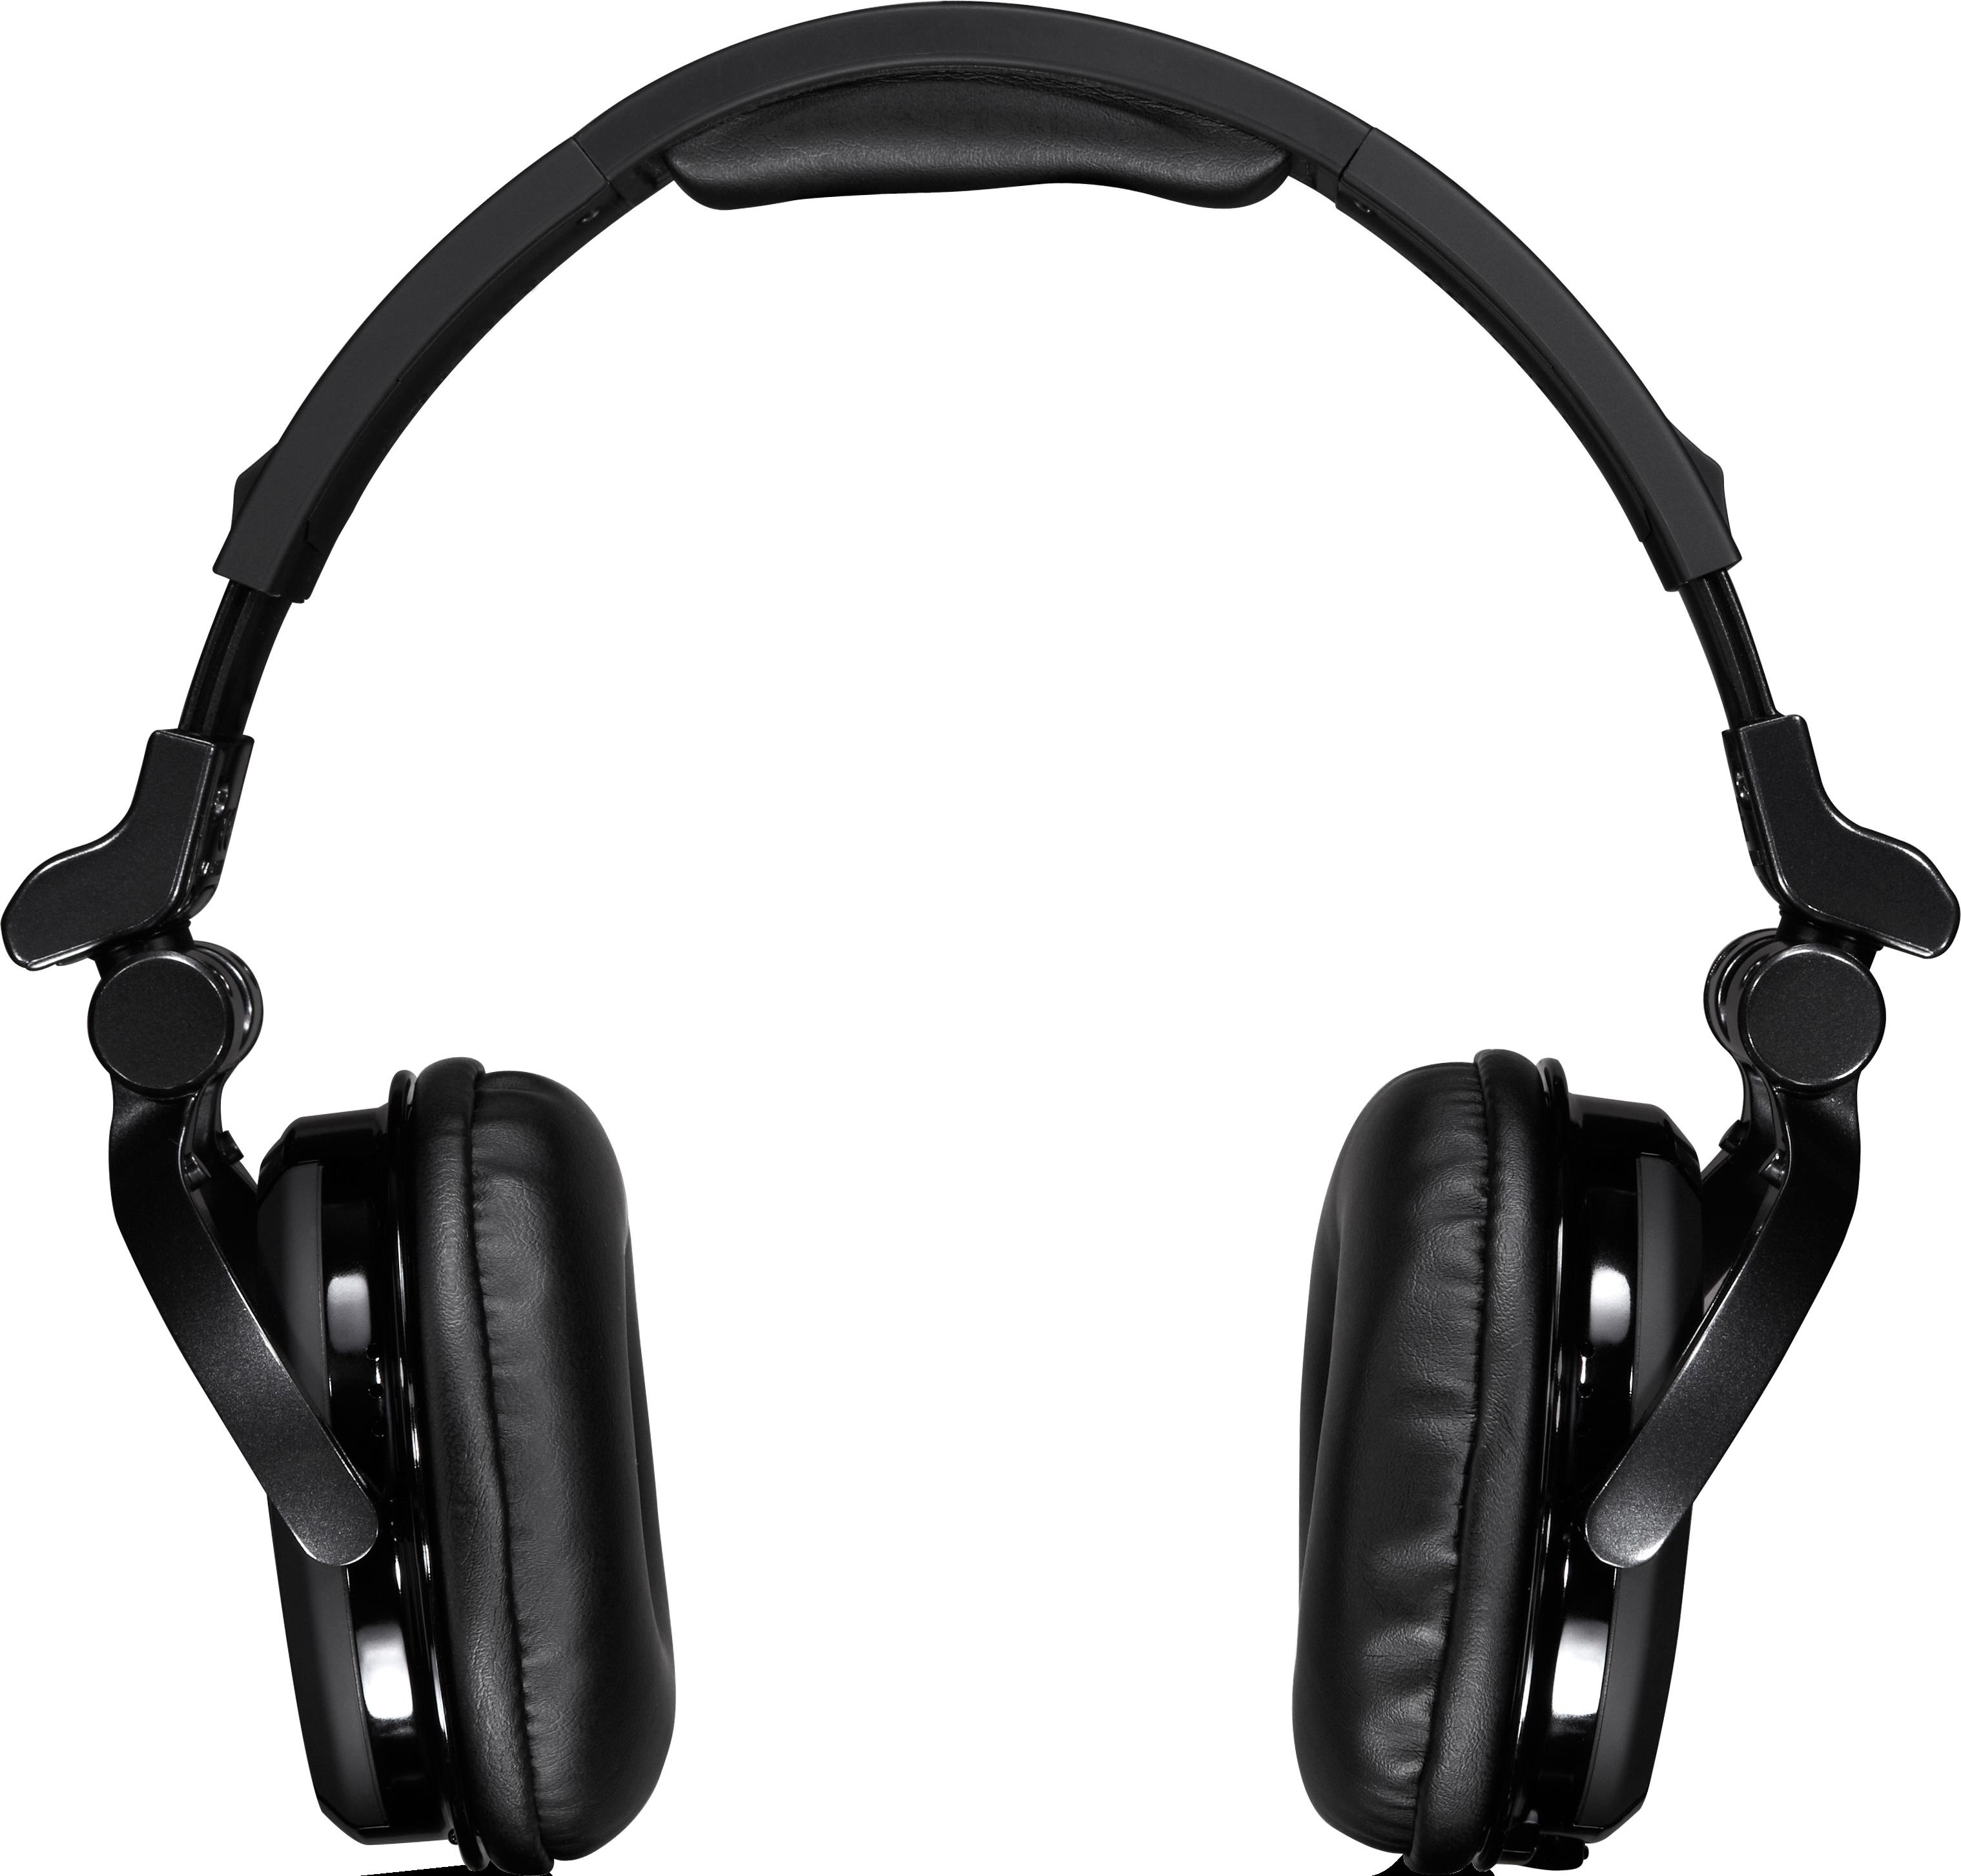 HDJ-1500